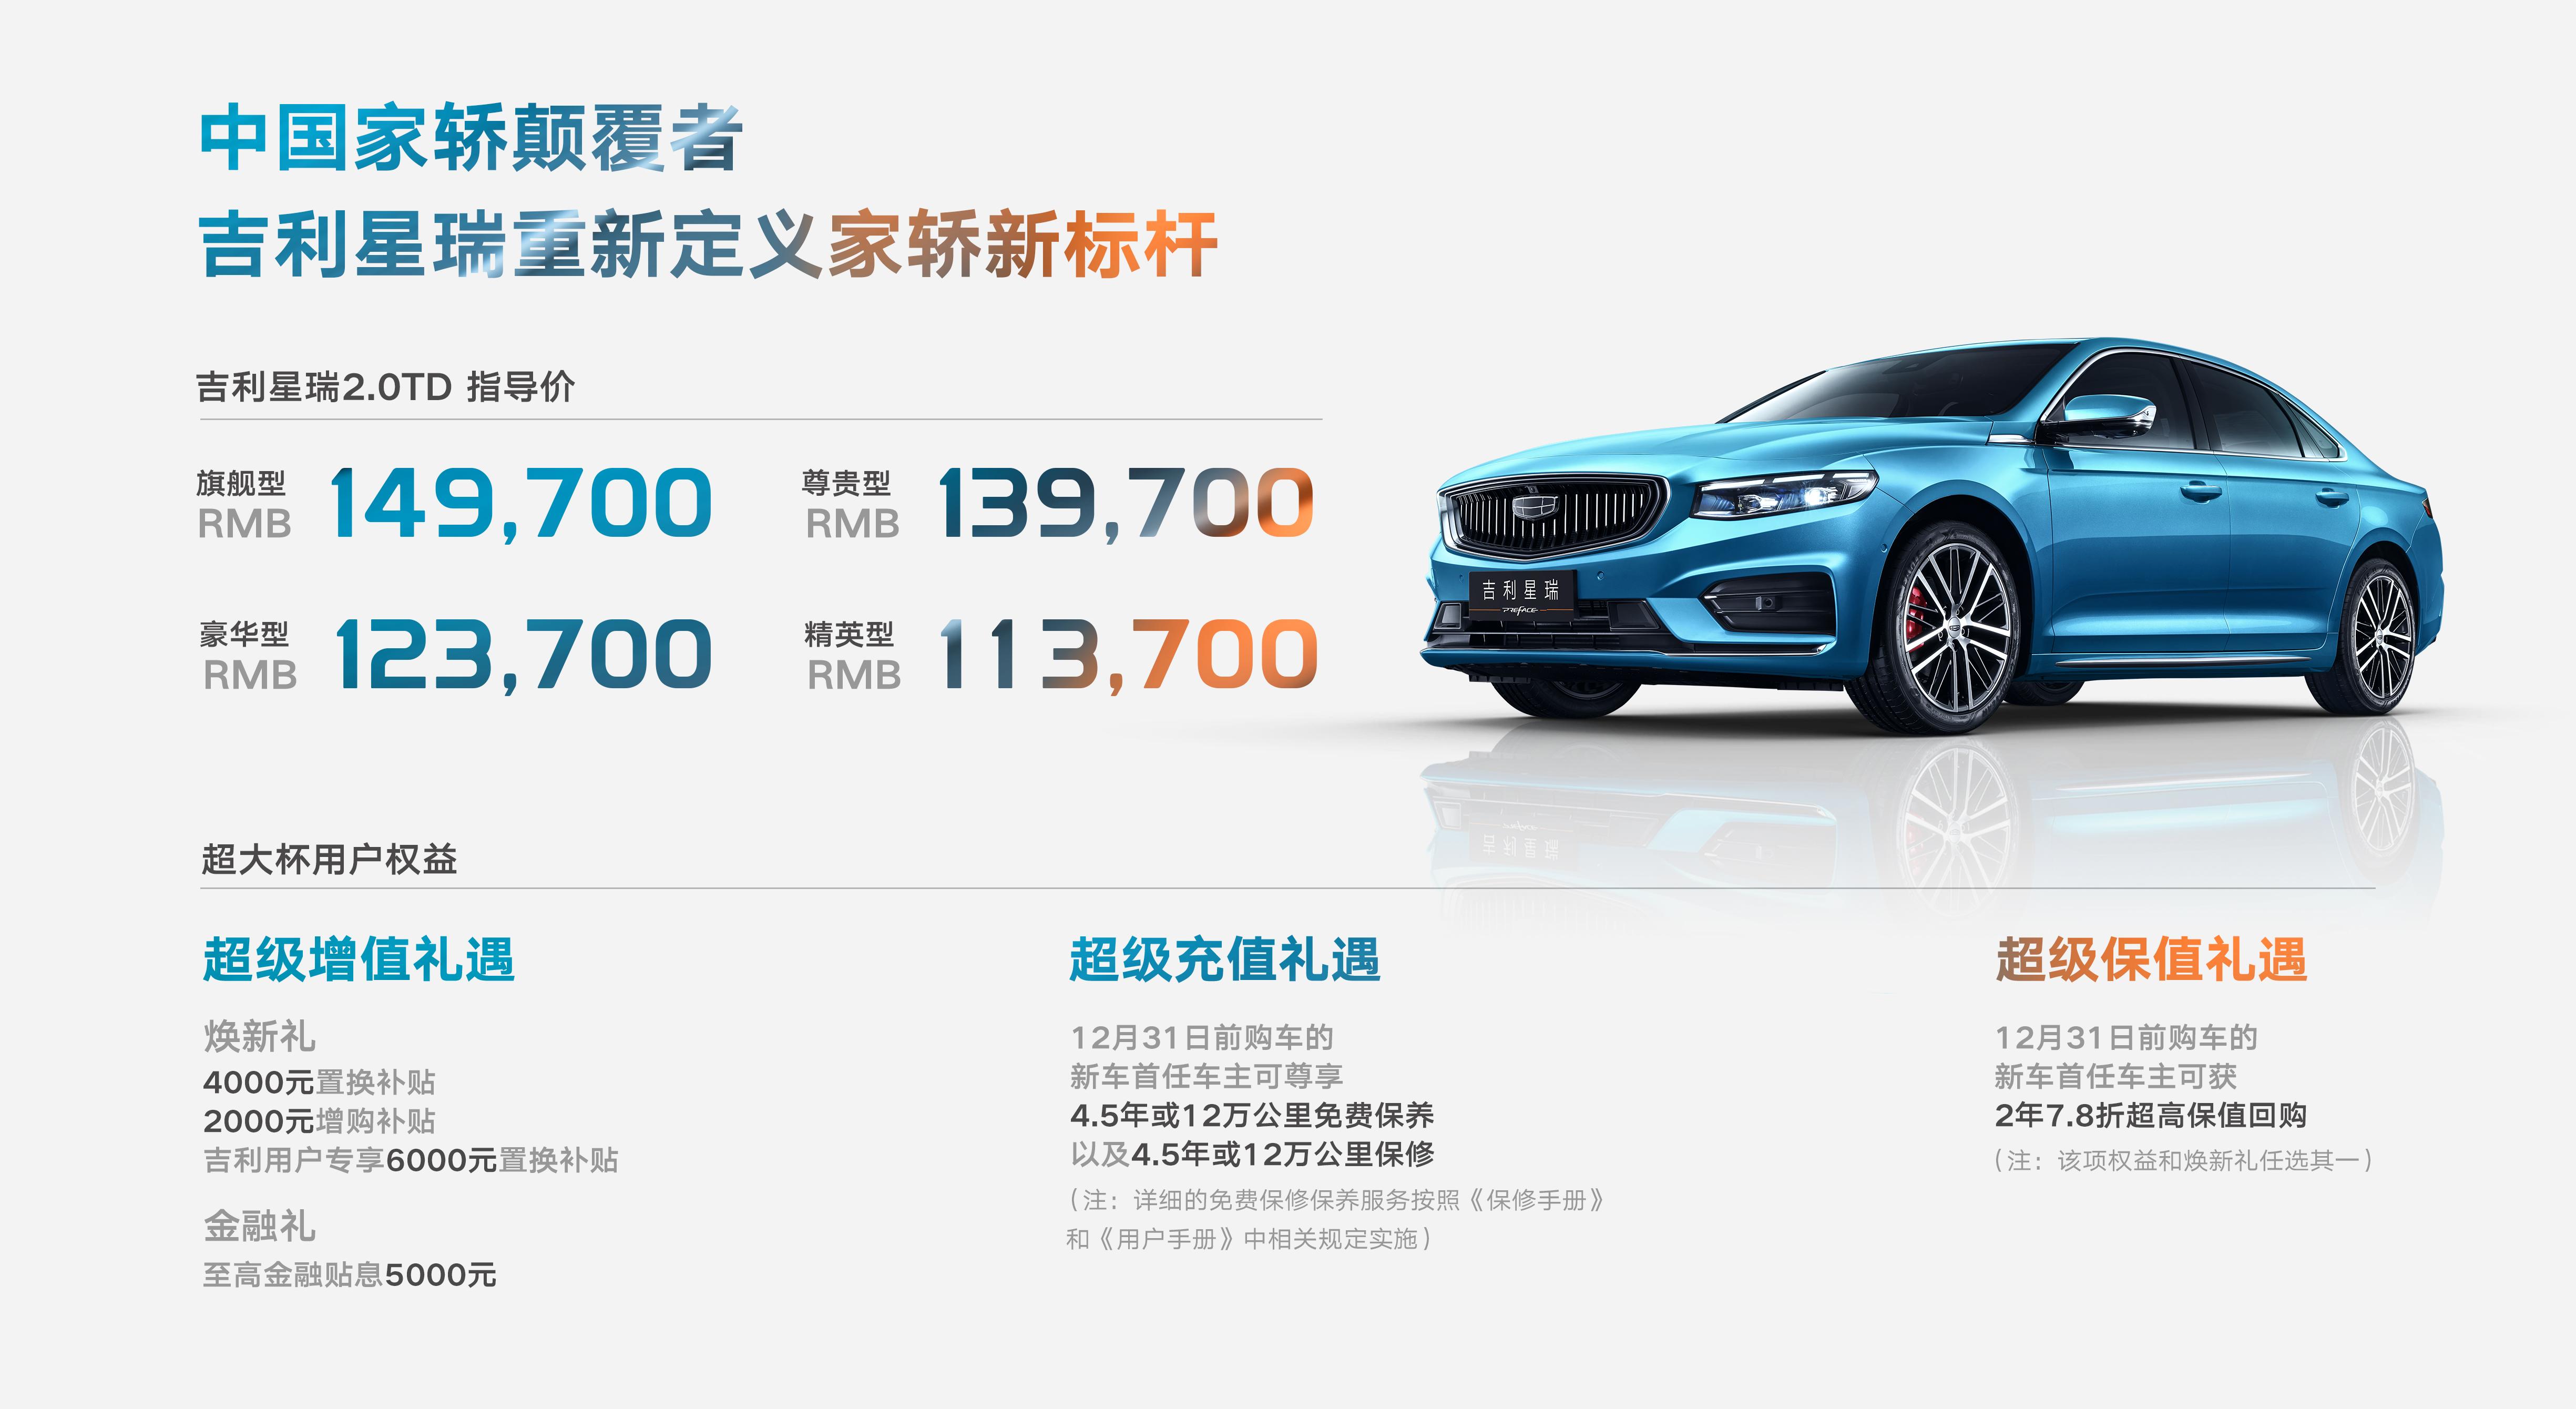 http://www.reviewcode.cn/yanfaguanli/179180.html